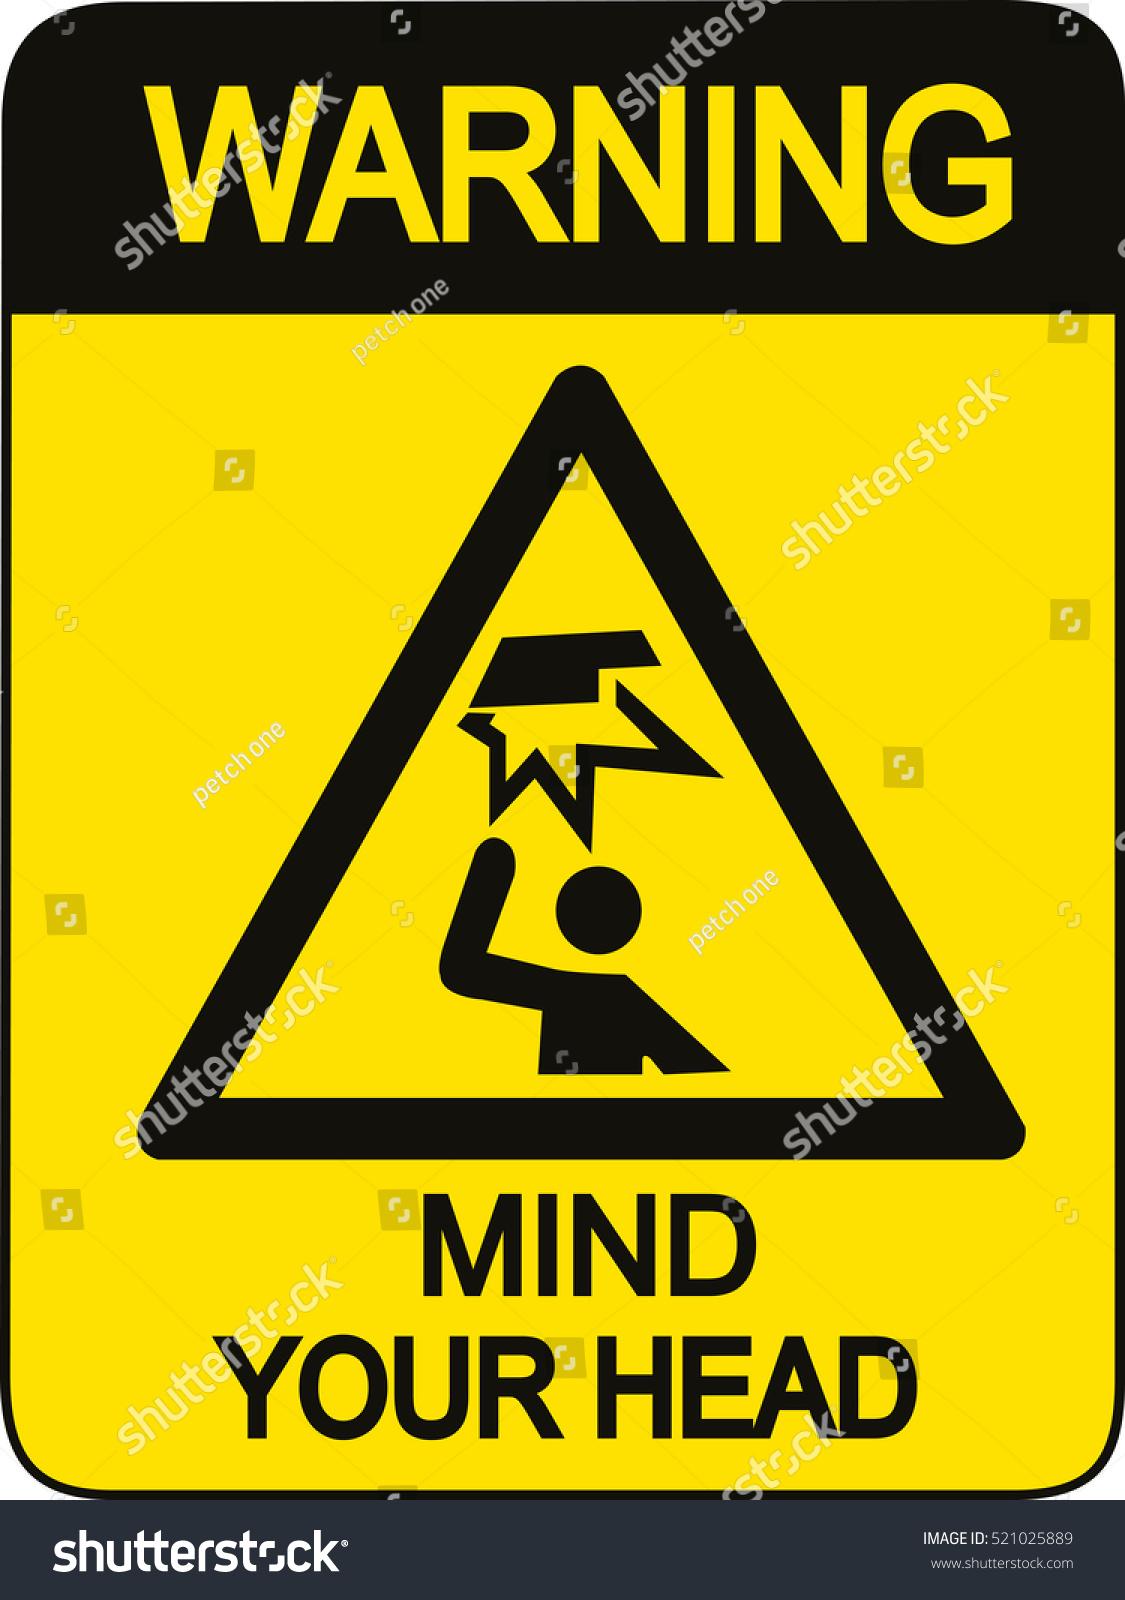 Warning Mind Your Head Stock Vector 521025889 Shutterstock